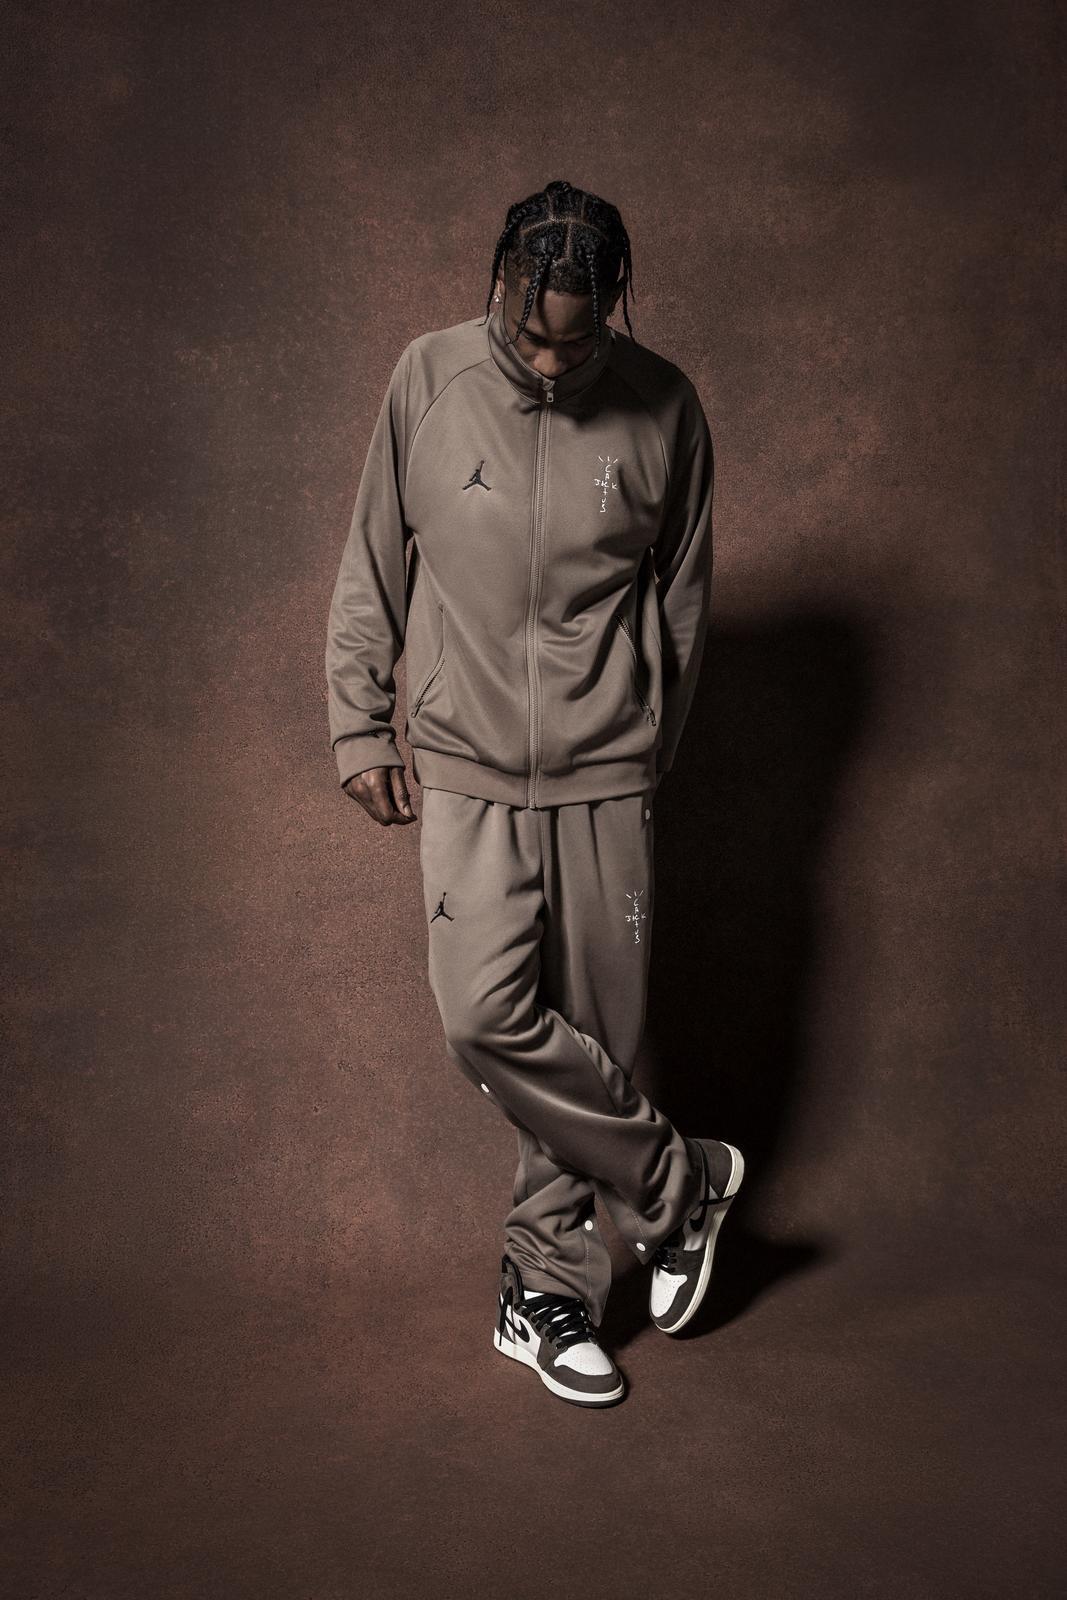 Nike Air Jordan 1 de Travis Scott aterram este mês